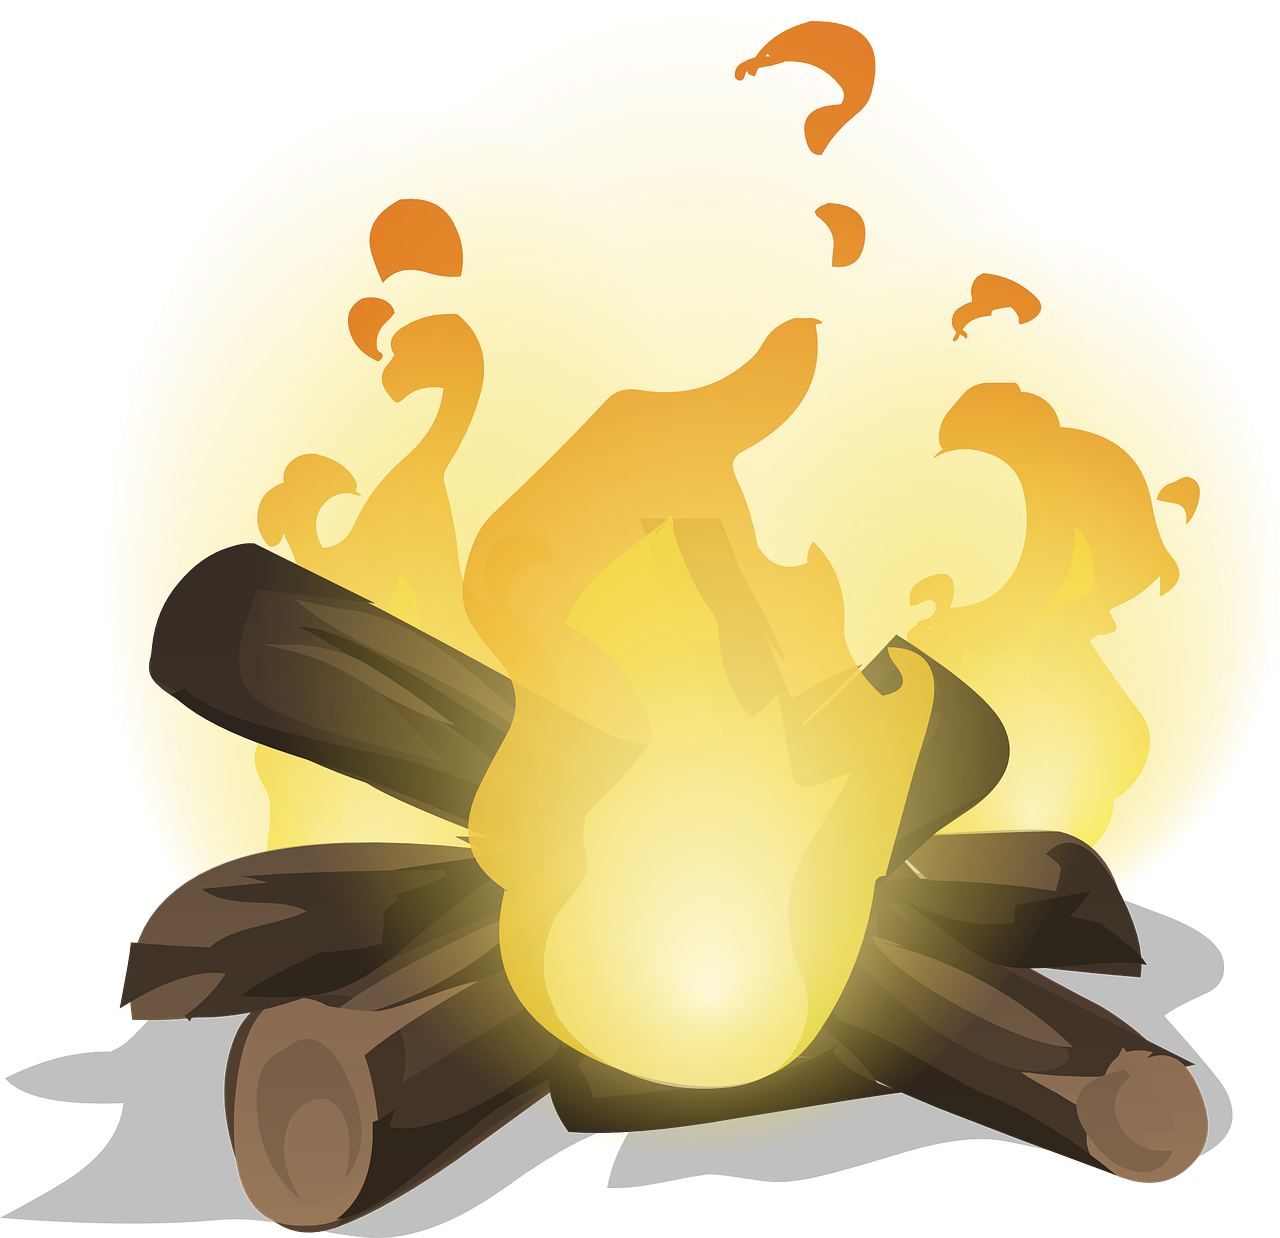 Płonie ognisko w lesie, piosenka harcerska, tekst i melodia